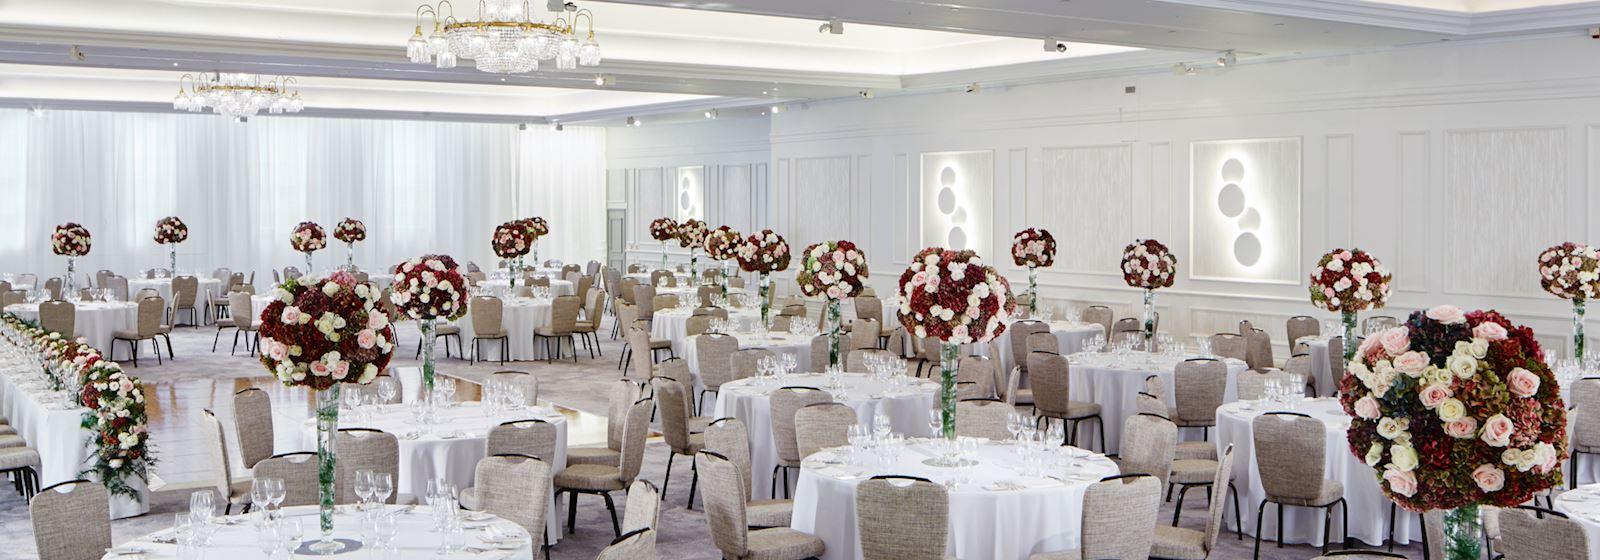 london marriott hotel grosvenor square wedding party spaces